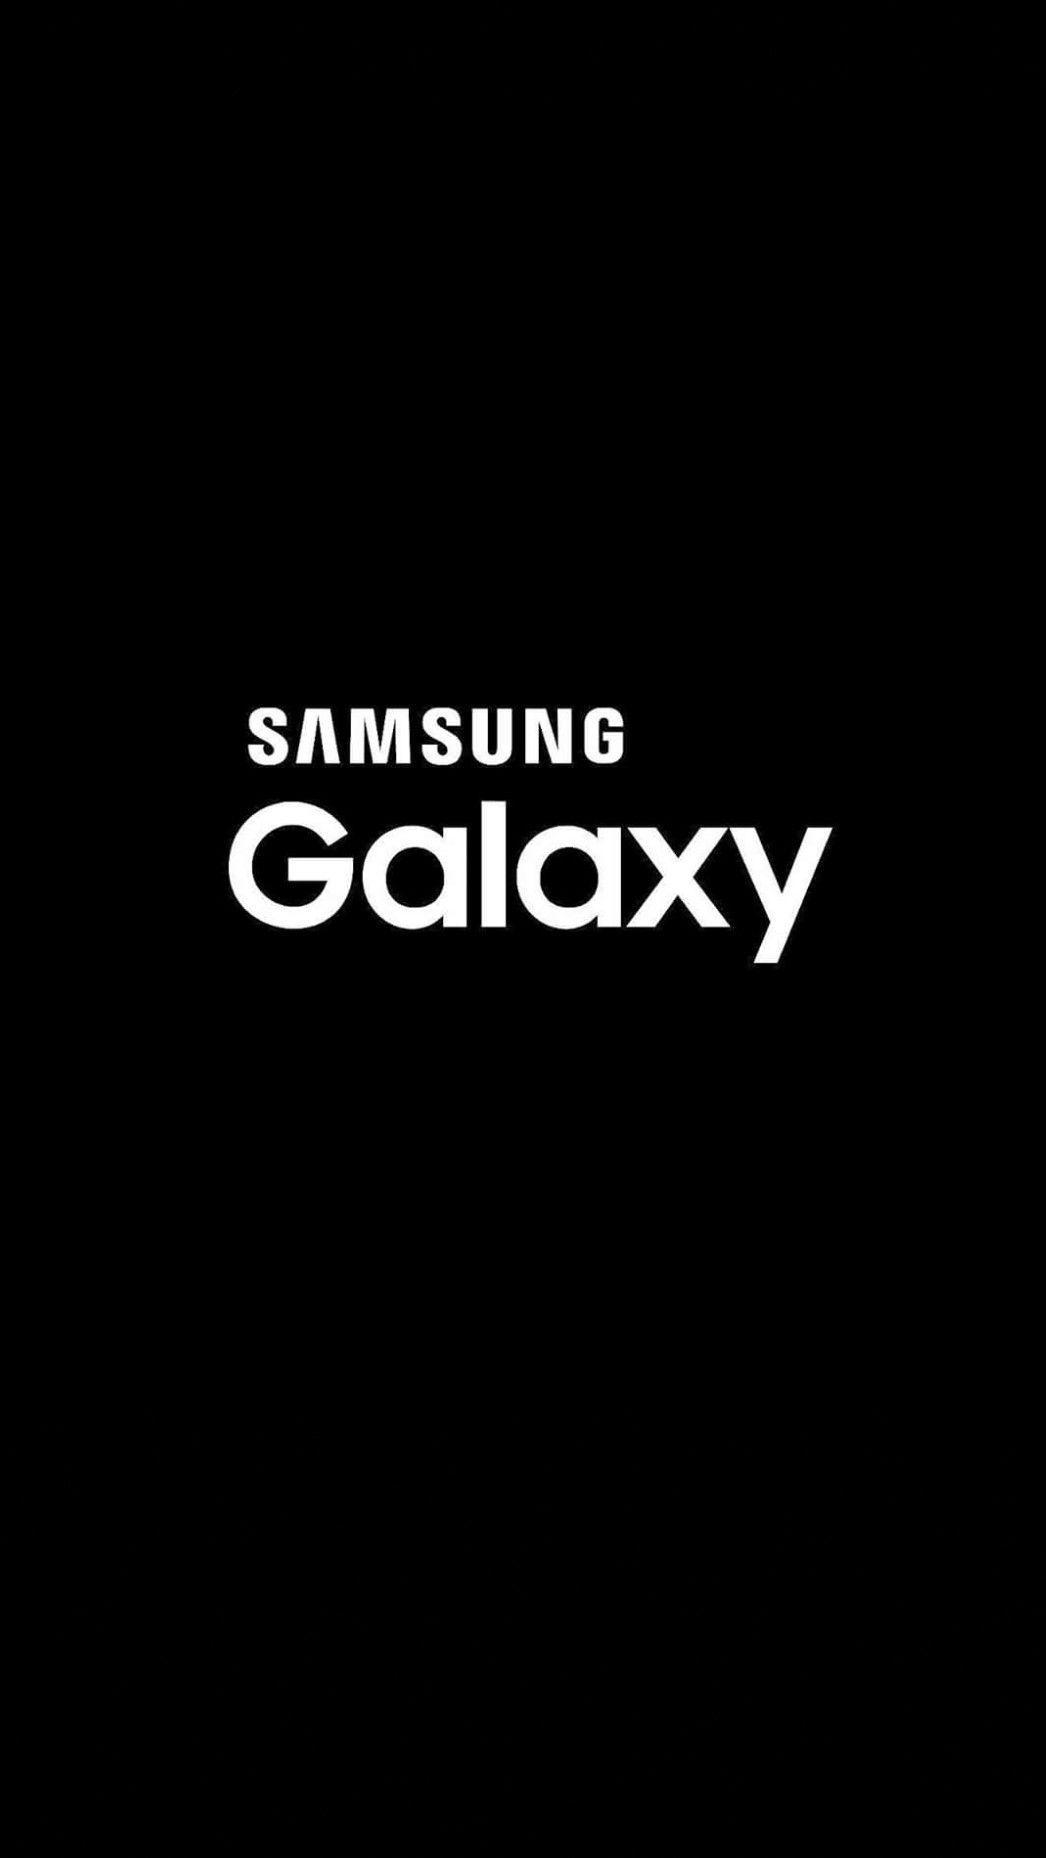 Samsung Wallpaper A30 Hintergrundbild Tapete Sam Em 2020 Papel De Parede Samsung Papel De Parede Para Samsung Galaxy Samsung Papel De Parede